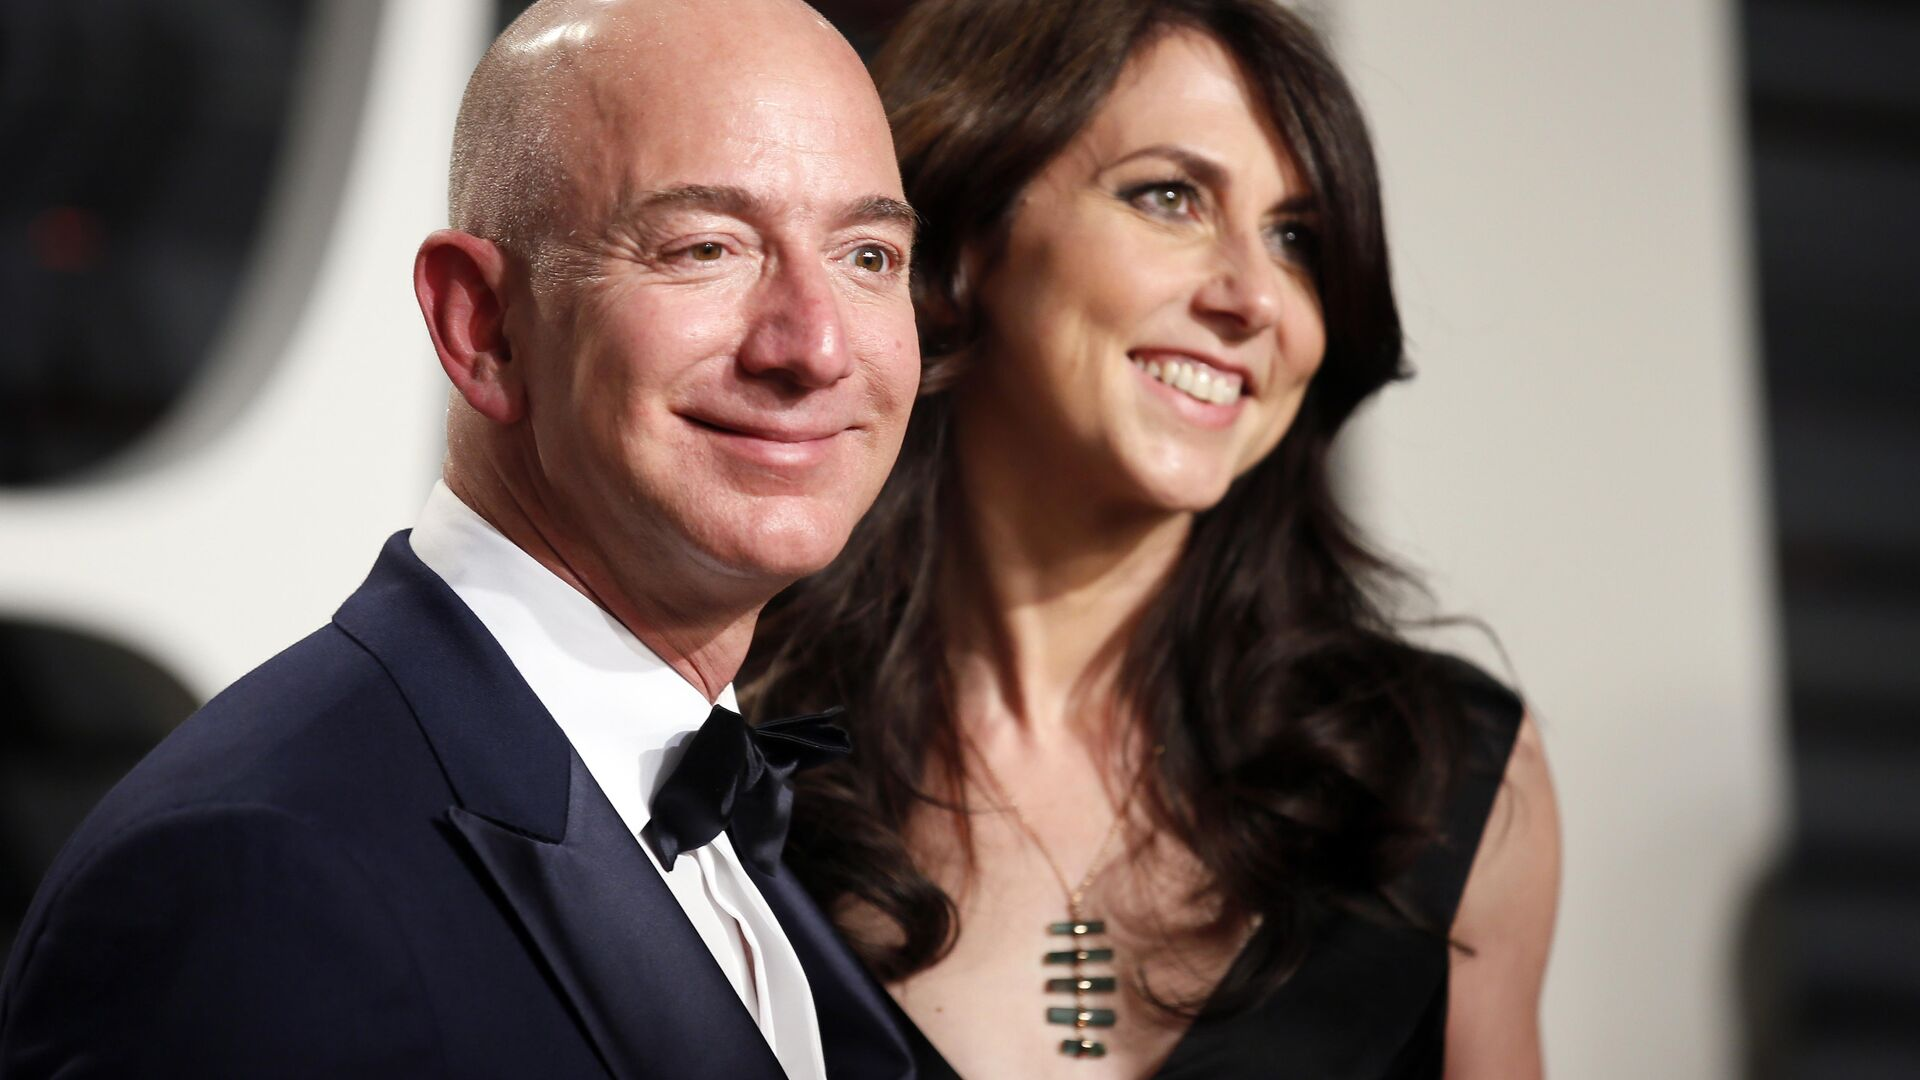 Jeff Bezos di Amazon e sua moglie MacKenzie Bezos. - Sputnik Italia, 1920, 03.02.2021